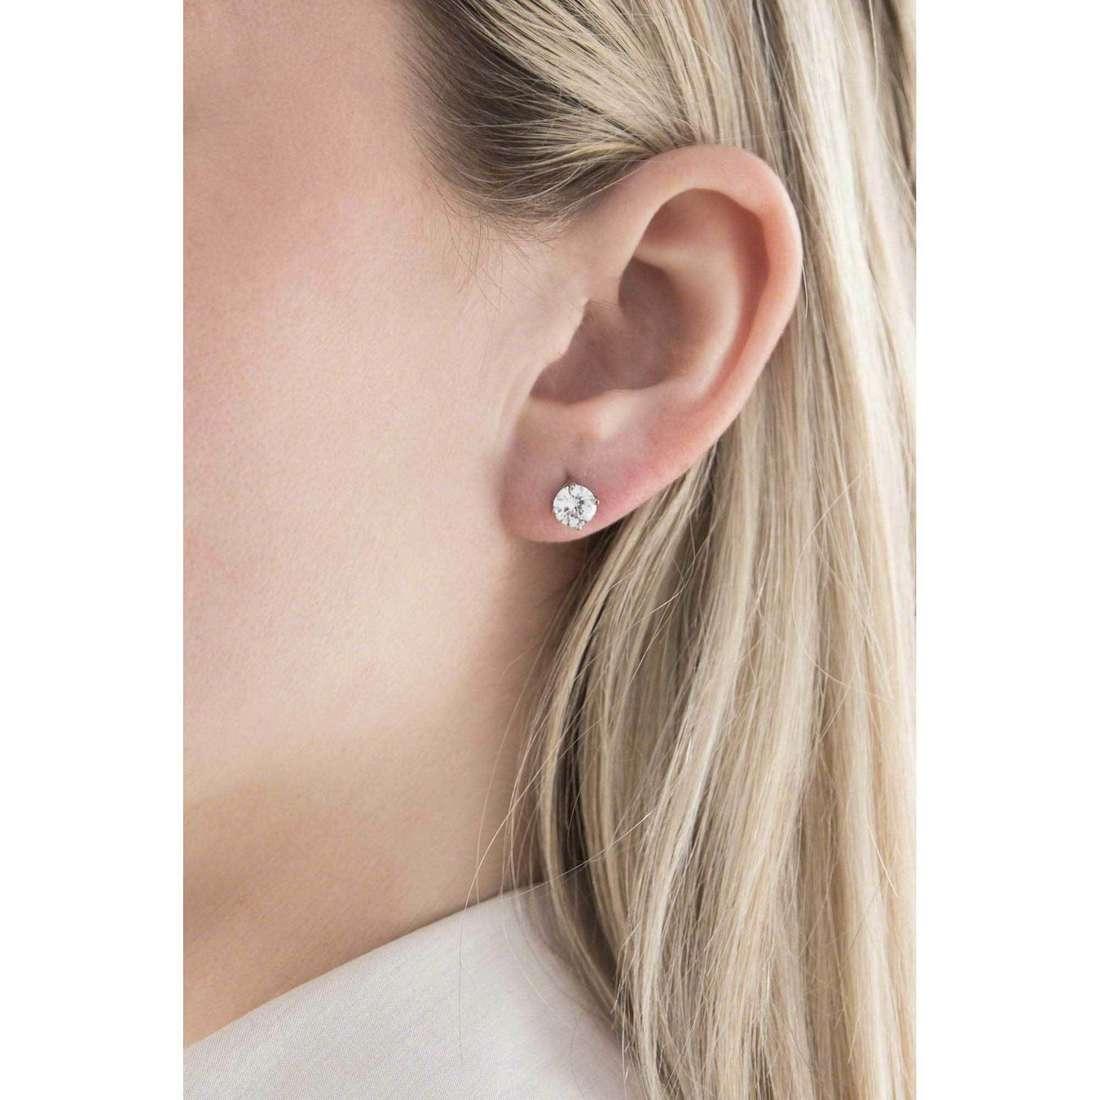 Morellato boucles d'oreille Luce femme SRL04 indosso